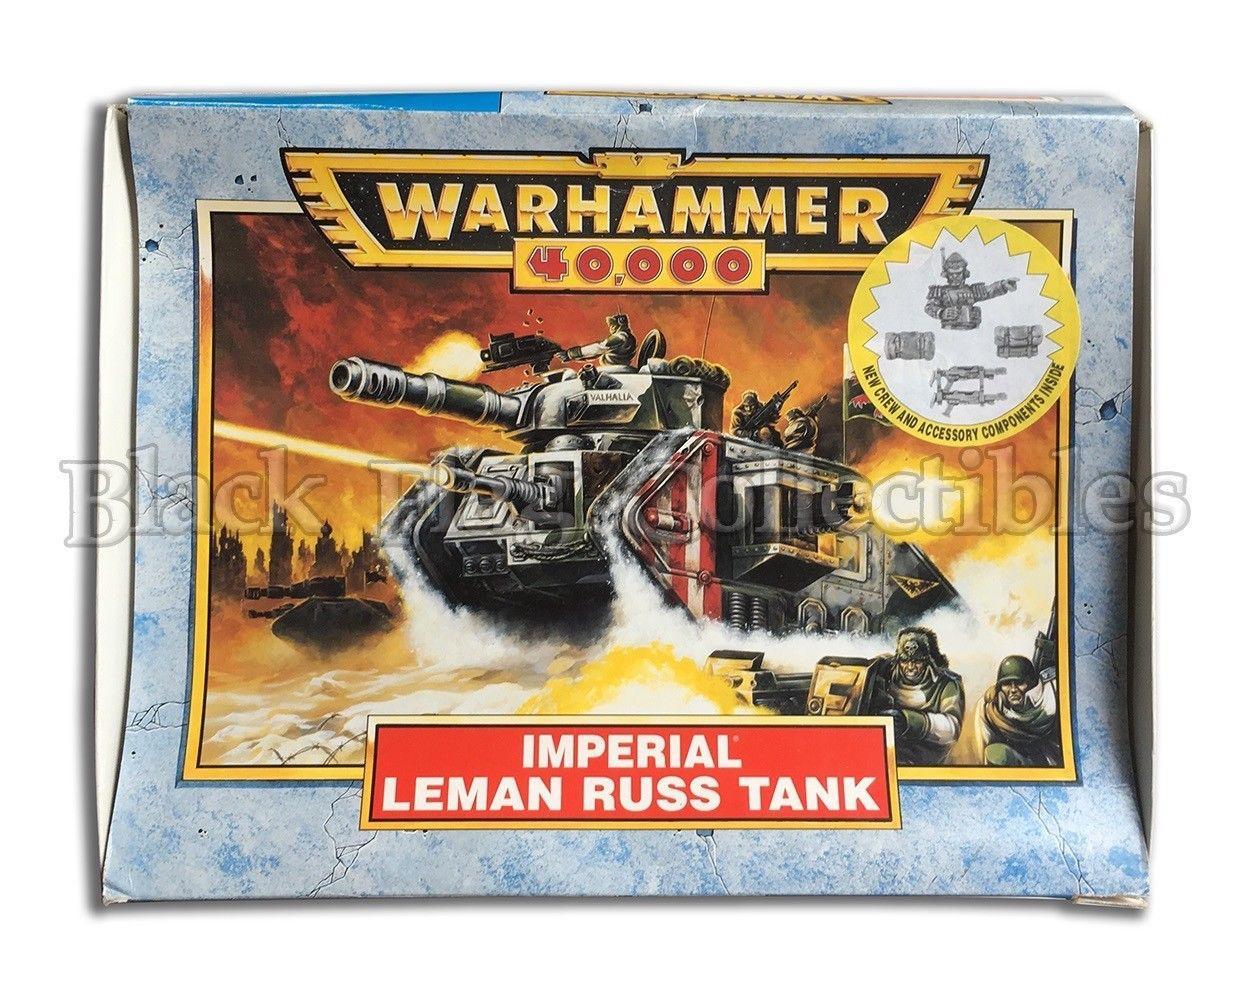 Citadel, Imperial Guard, Leman Russ, Plastic, Warhammer 40,000